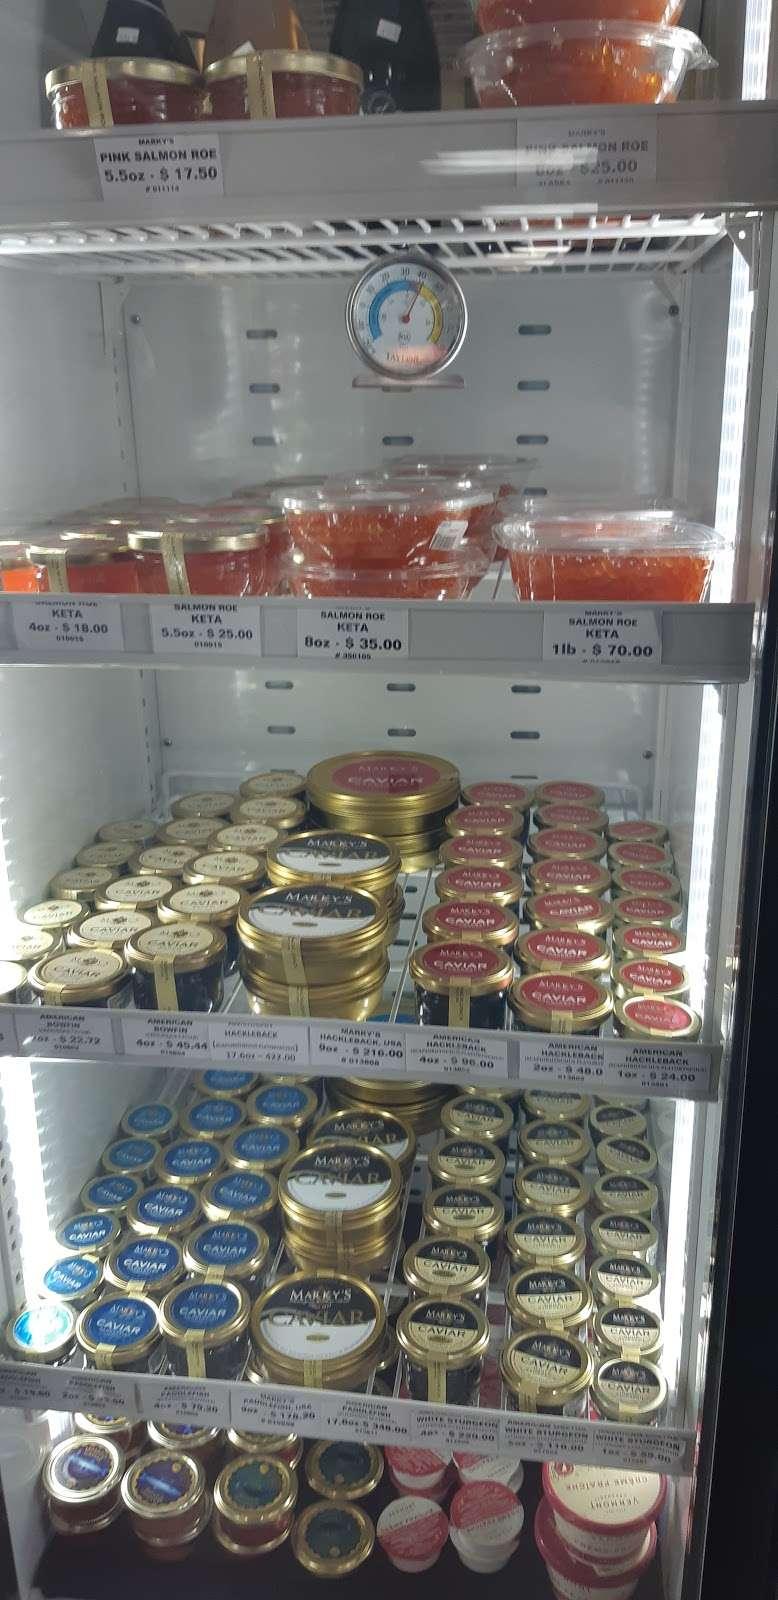 Russian Store - store  | Photo 4 of 10 | Address: 683 NE 79th St, Miami, FL 33138, USA | Phone: (305) 758-2005